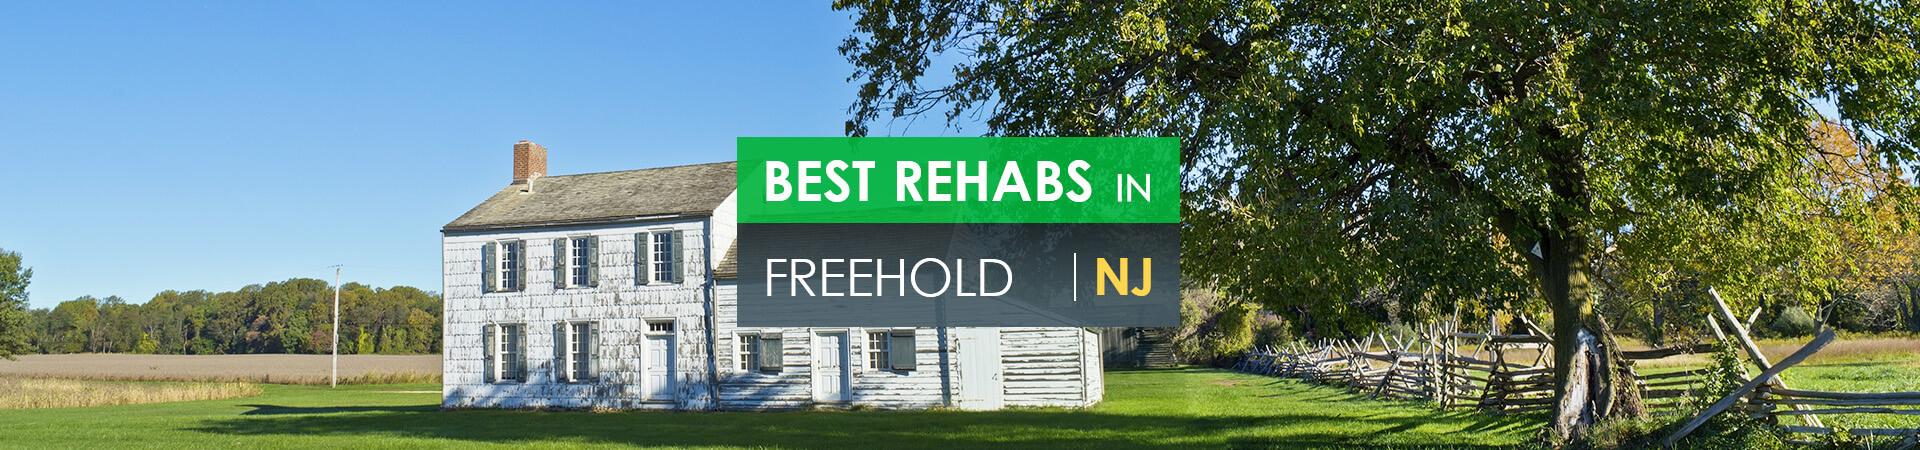 Best rehabs in Freehold, NJ